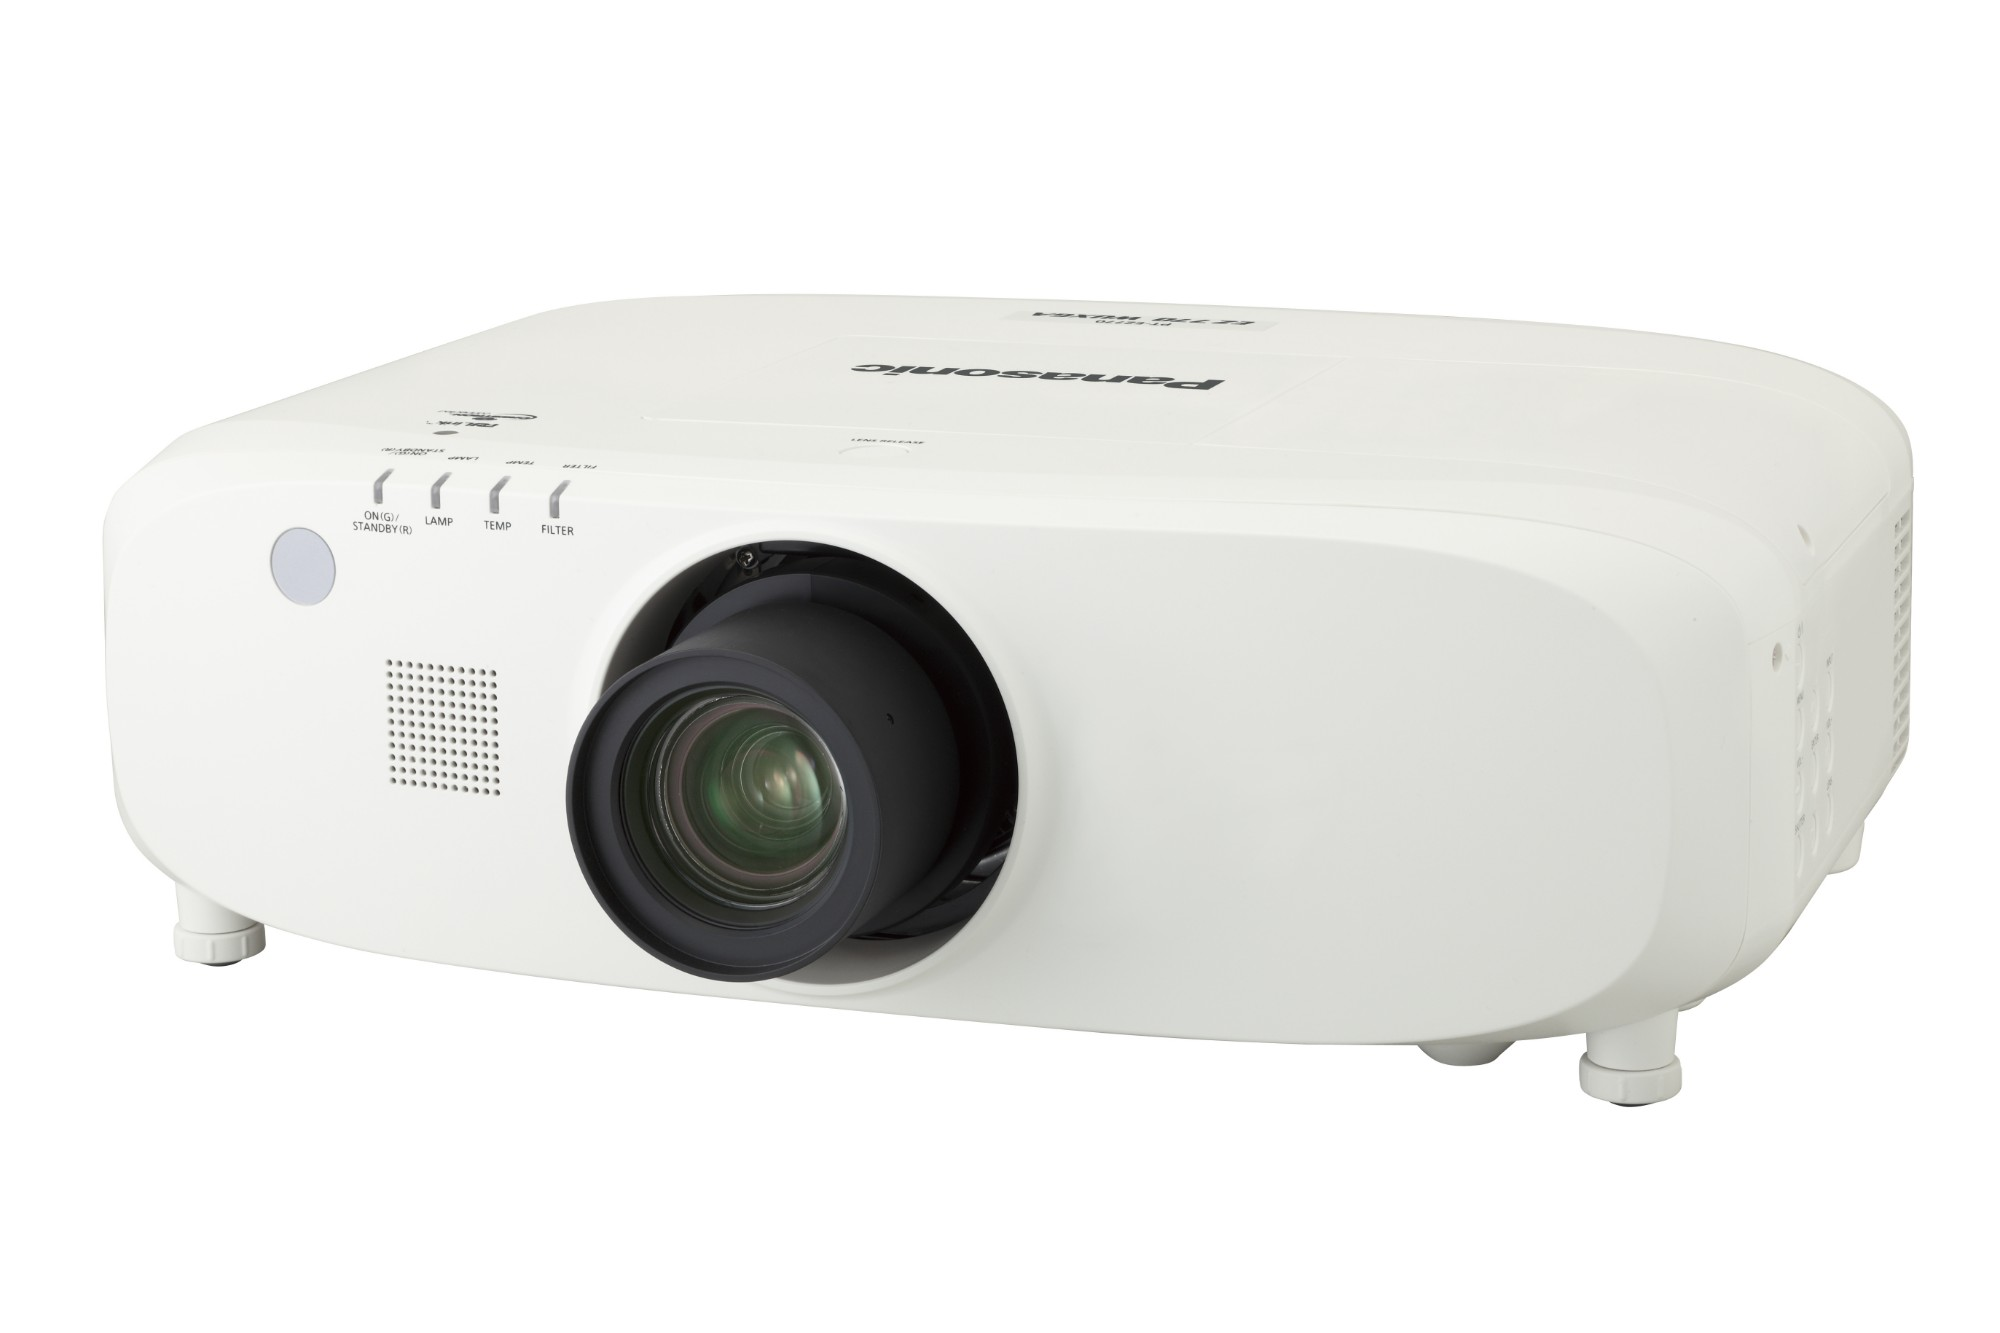 Panasonic PT-EZ770ZLEJ data projector 6500 ANSI lumens LCD WUXGA (1920x1200) Desktop projector White